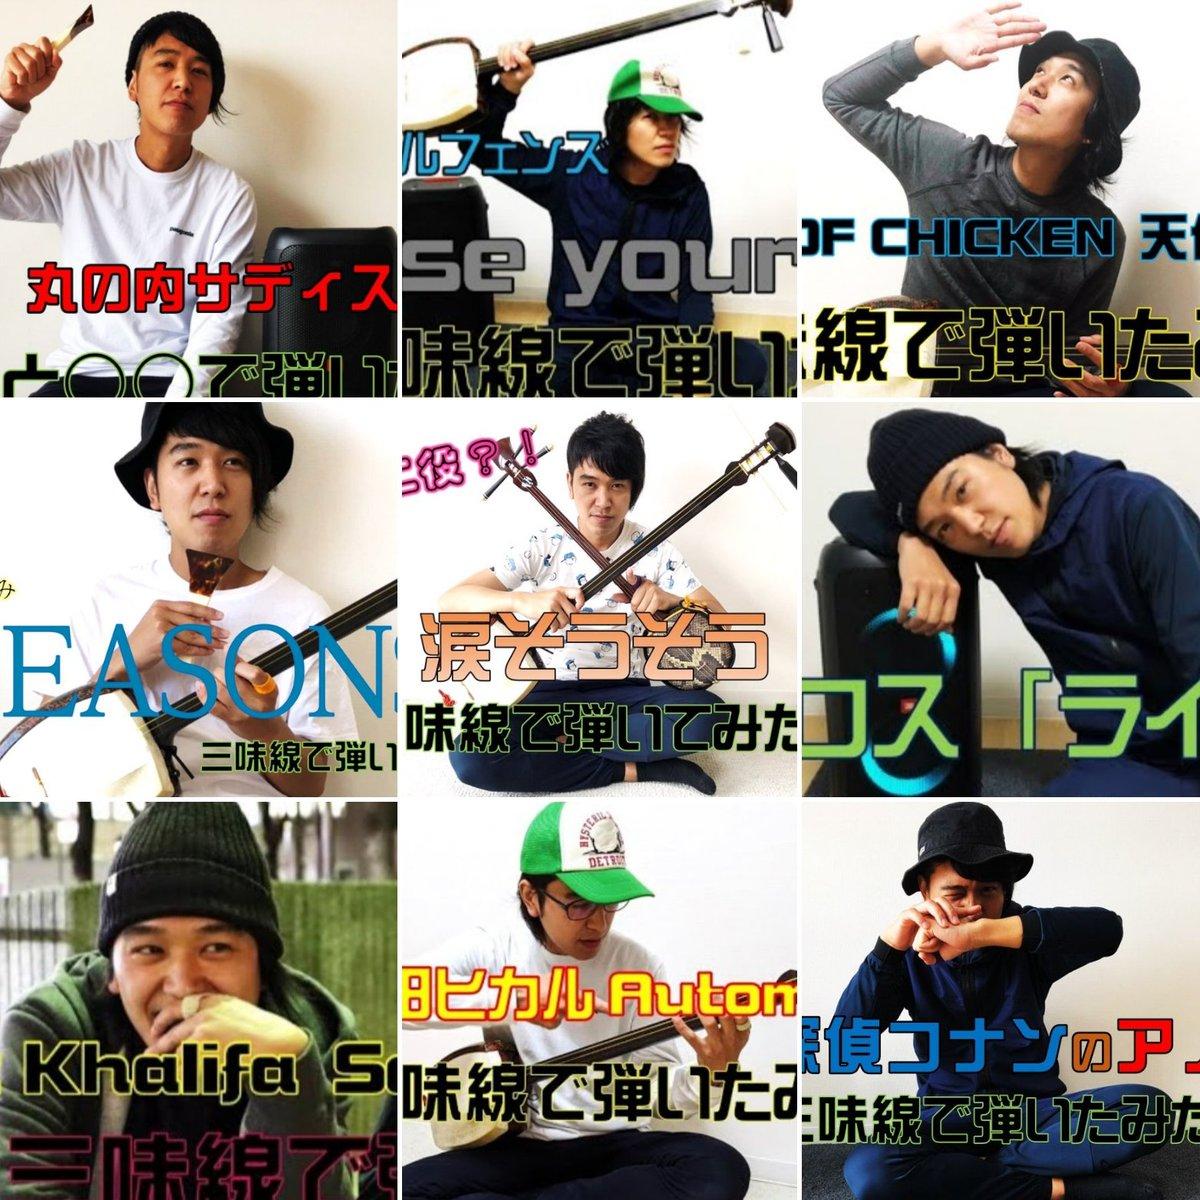 Music changes the world♪ Everyone please follow him♡ https://youtu.be/pNH9r680ph8  @koji0507 #山口晃司 #kojiyamaguchi #YouTube #Instagram #follow #世界最速 #三味線 #shamisen #japan #culture #music #song #world #StayHome #LiveLoveLaugh #感謝 #Thankspic.twitter.com/iUI67HVYvv